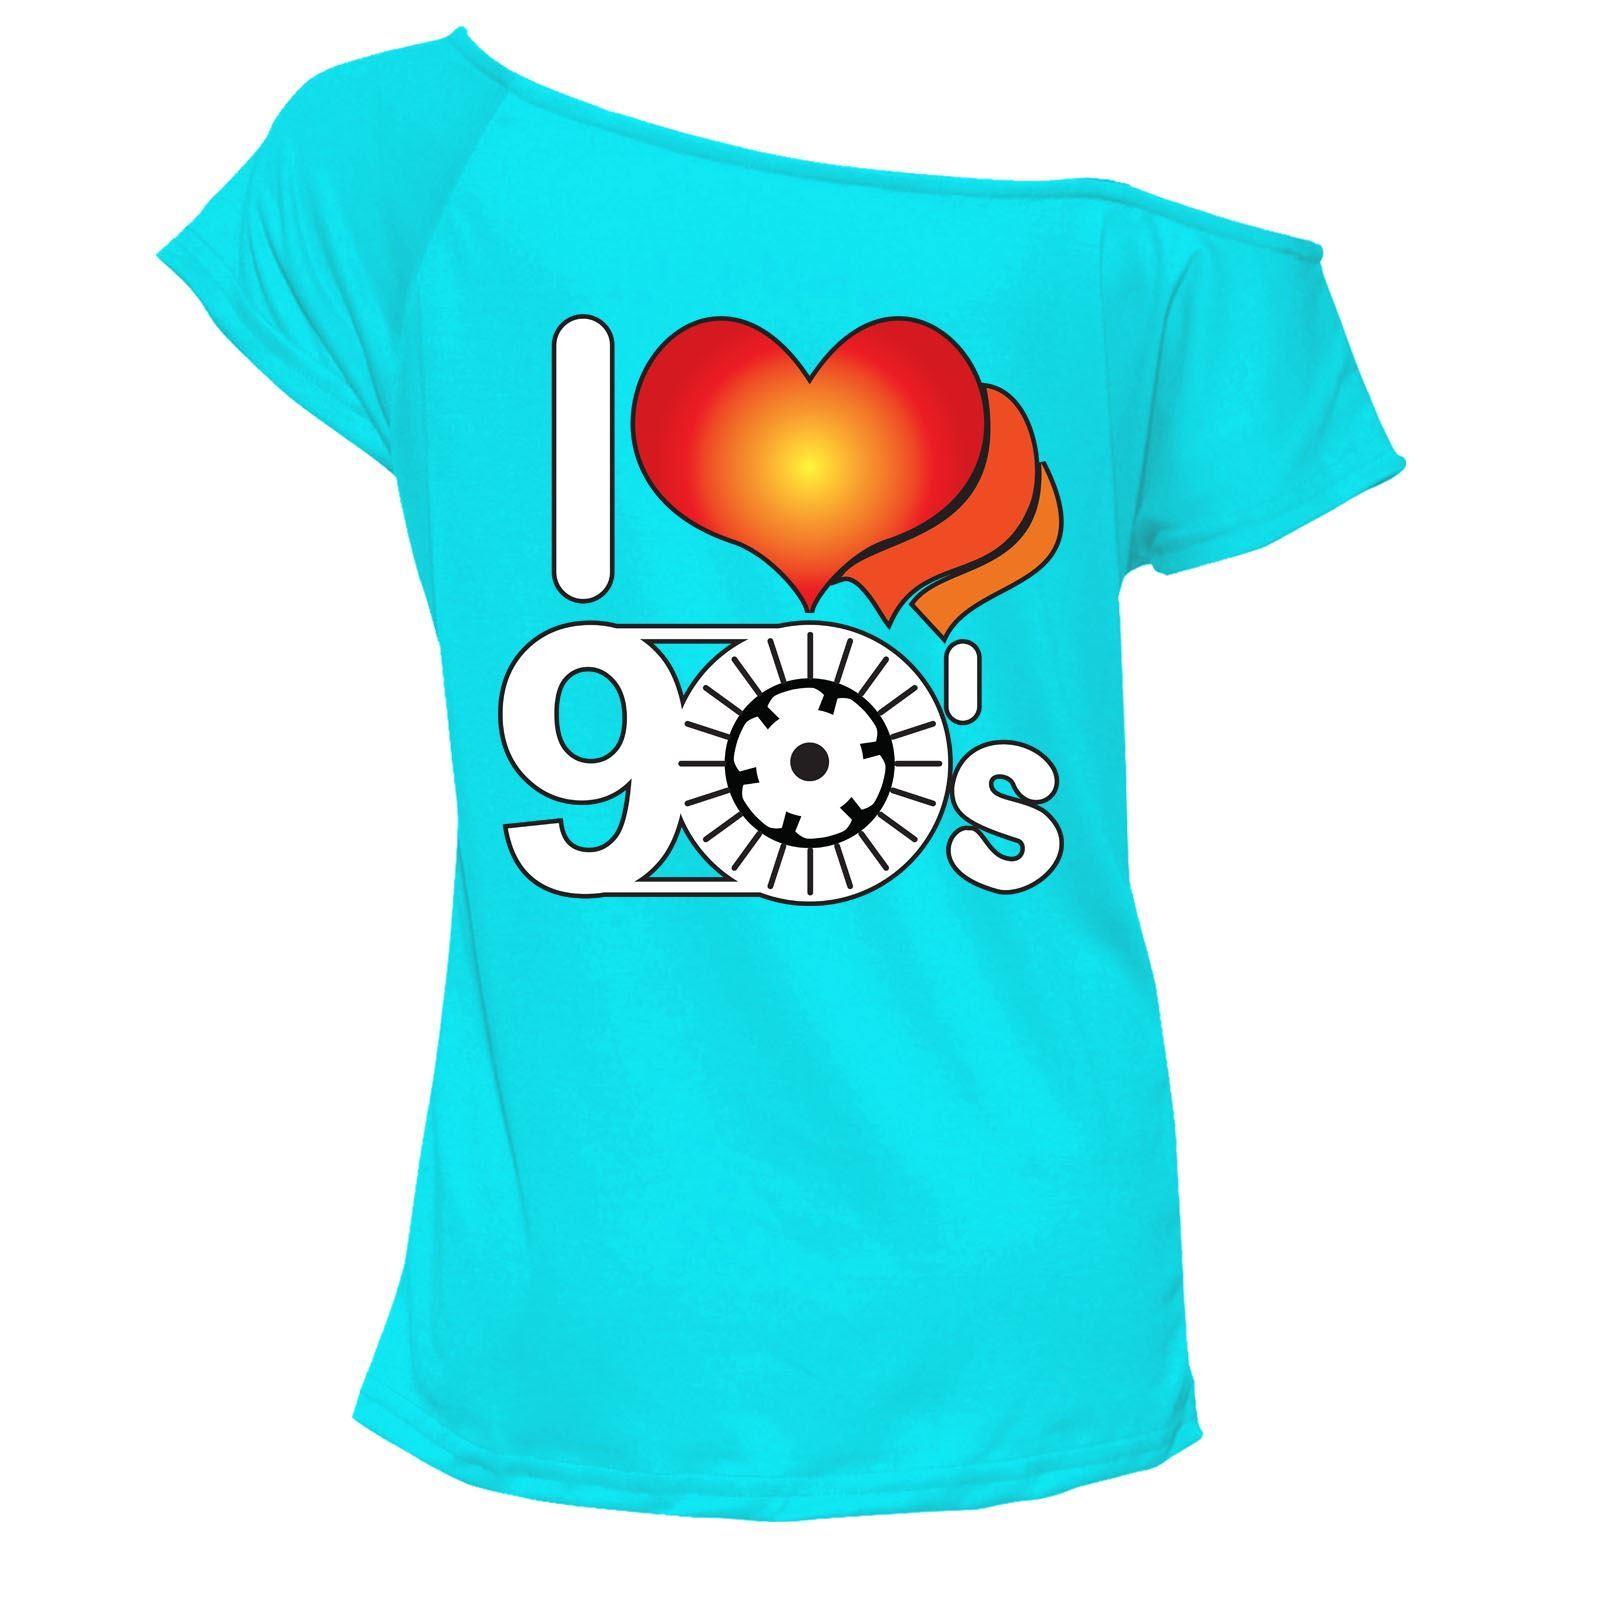 Me-encanta-el-90s-T-Shirt-Top-Hombro-Pop-Retro-Gallina-Fiesta-Discoteca-Outfit-6709-Lote